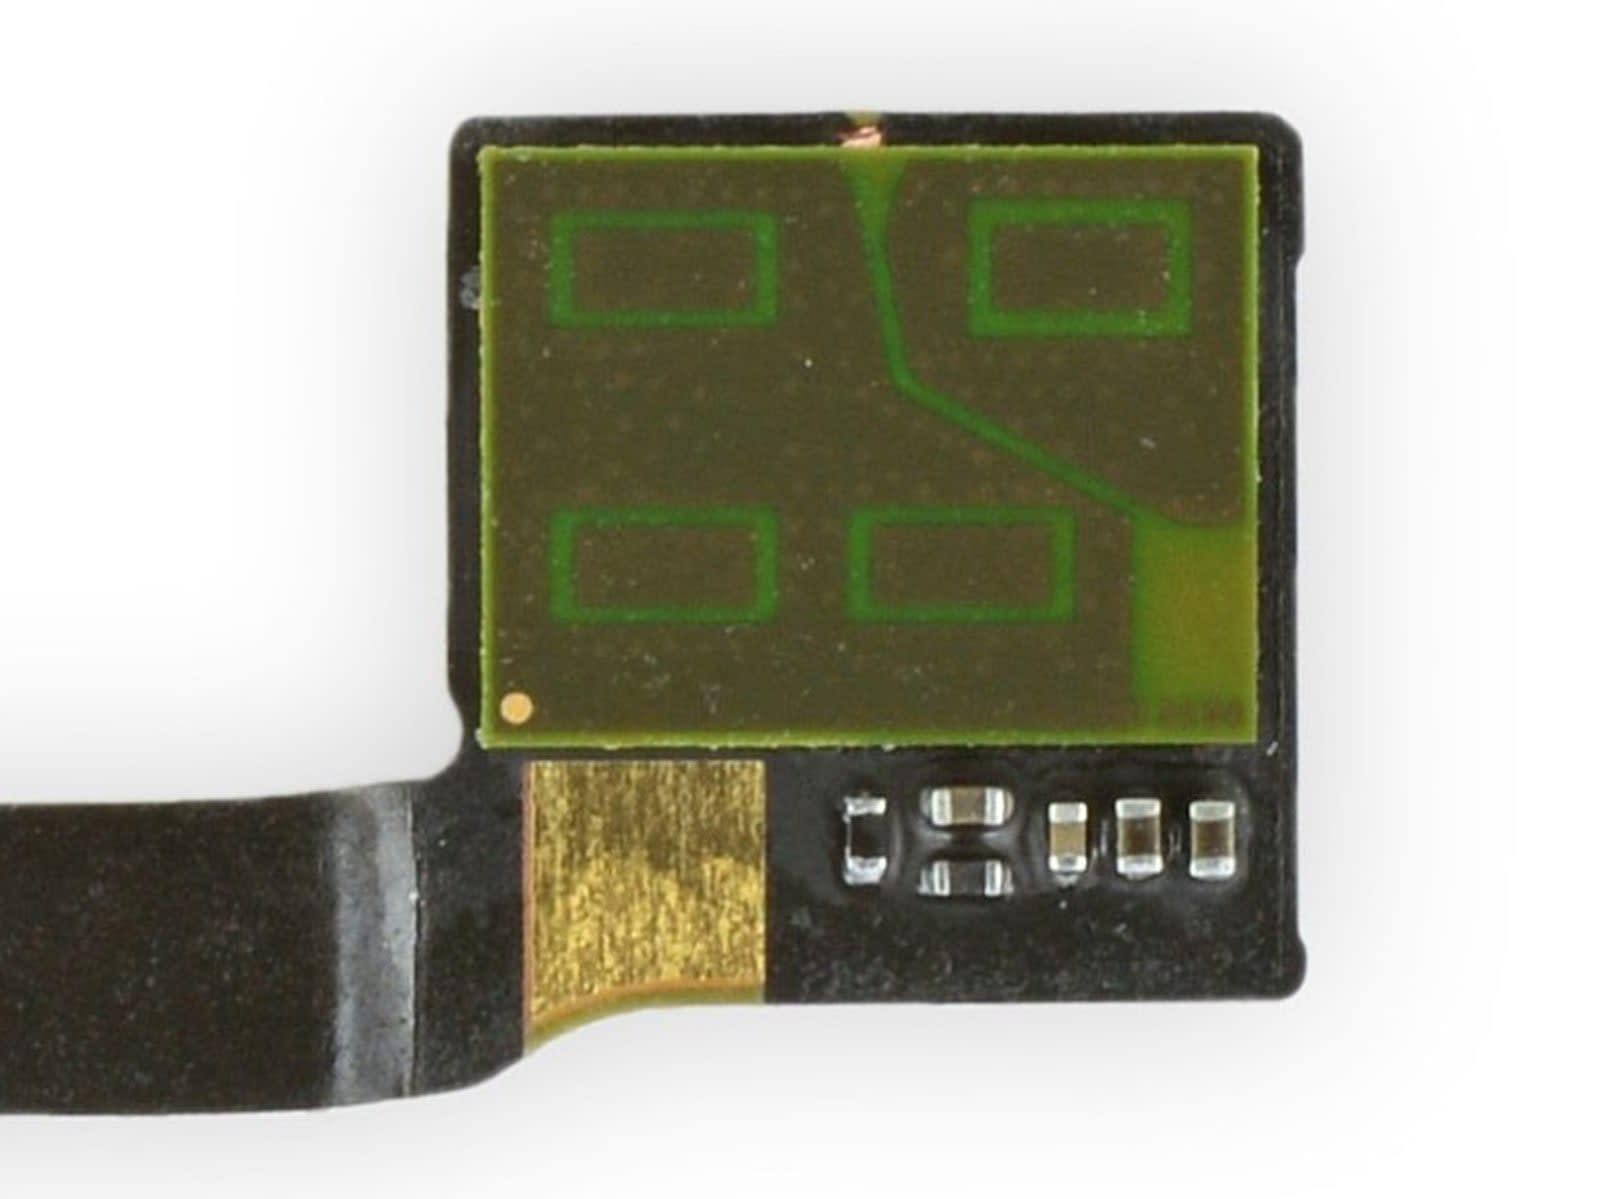 Pixel 4 Soli chip